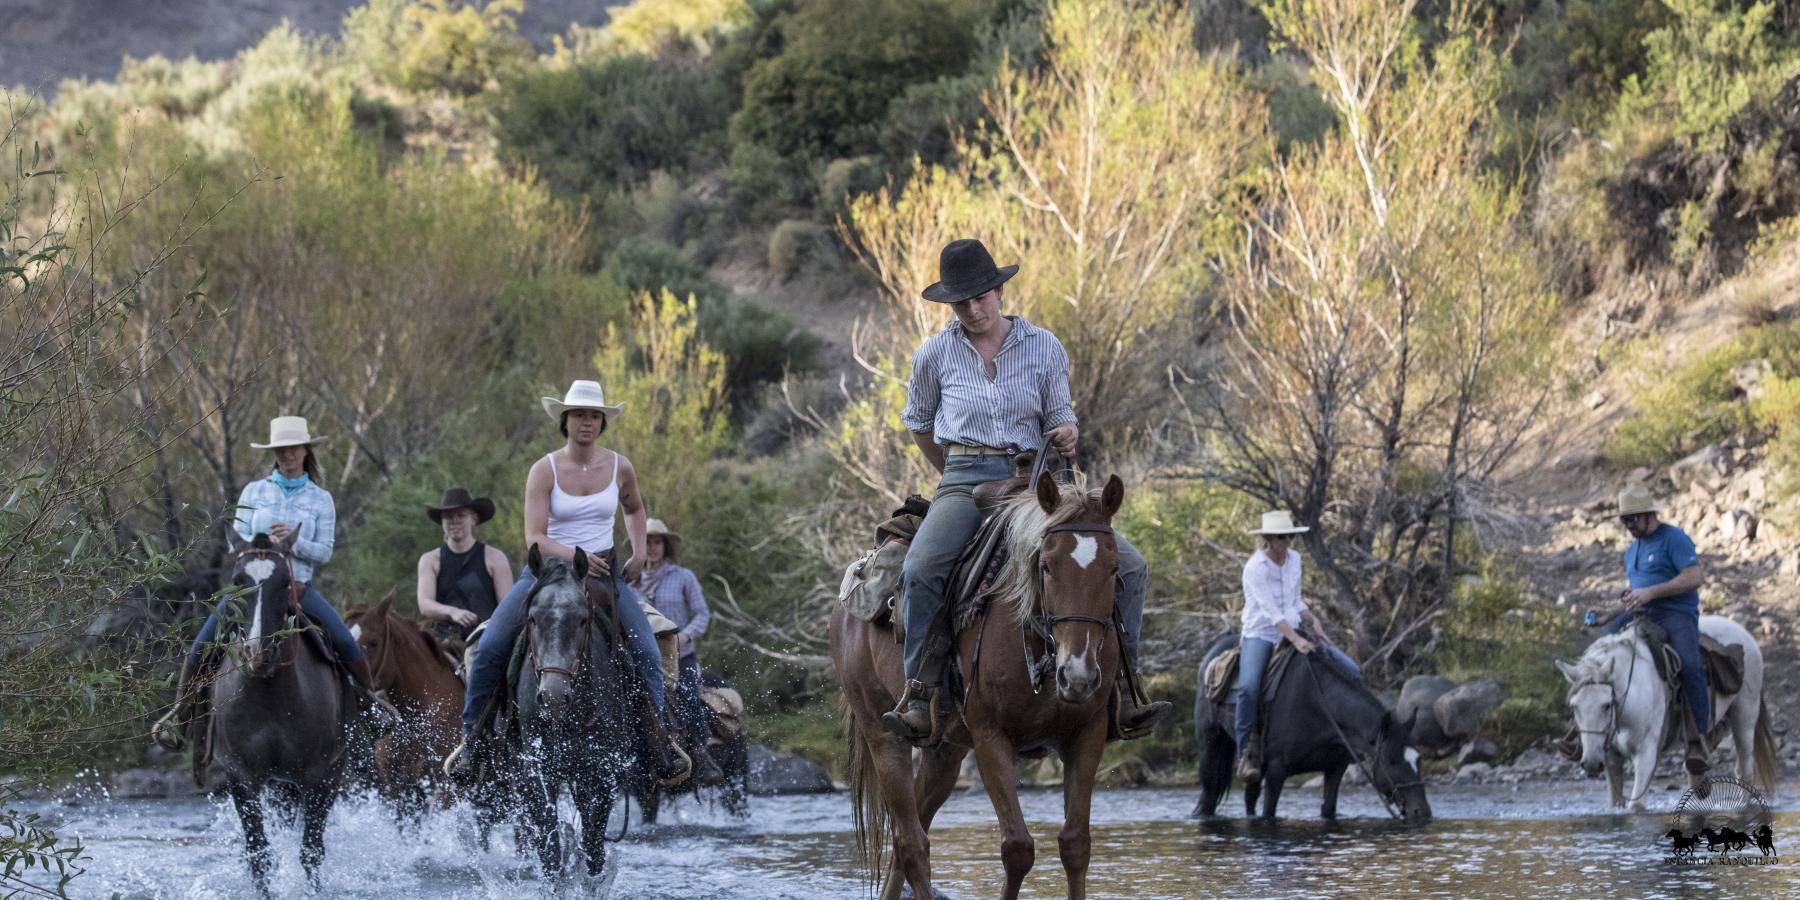 Criollo horses crossing the river